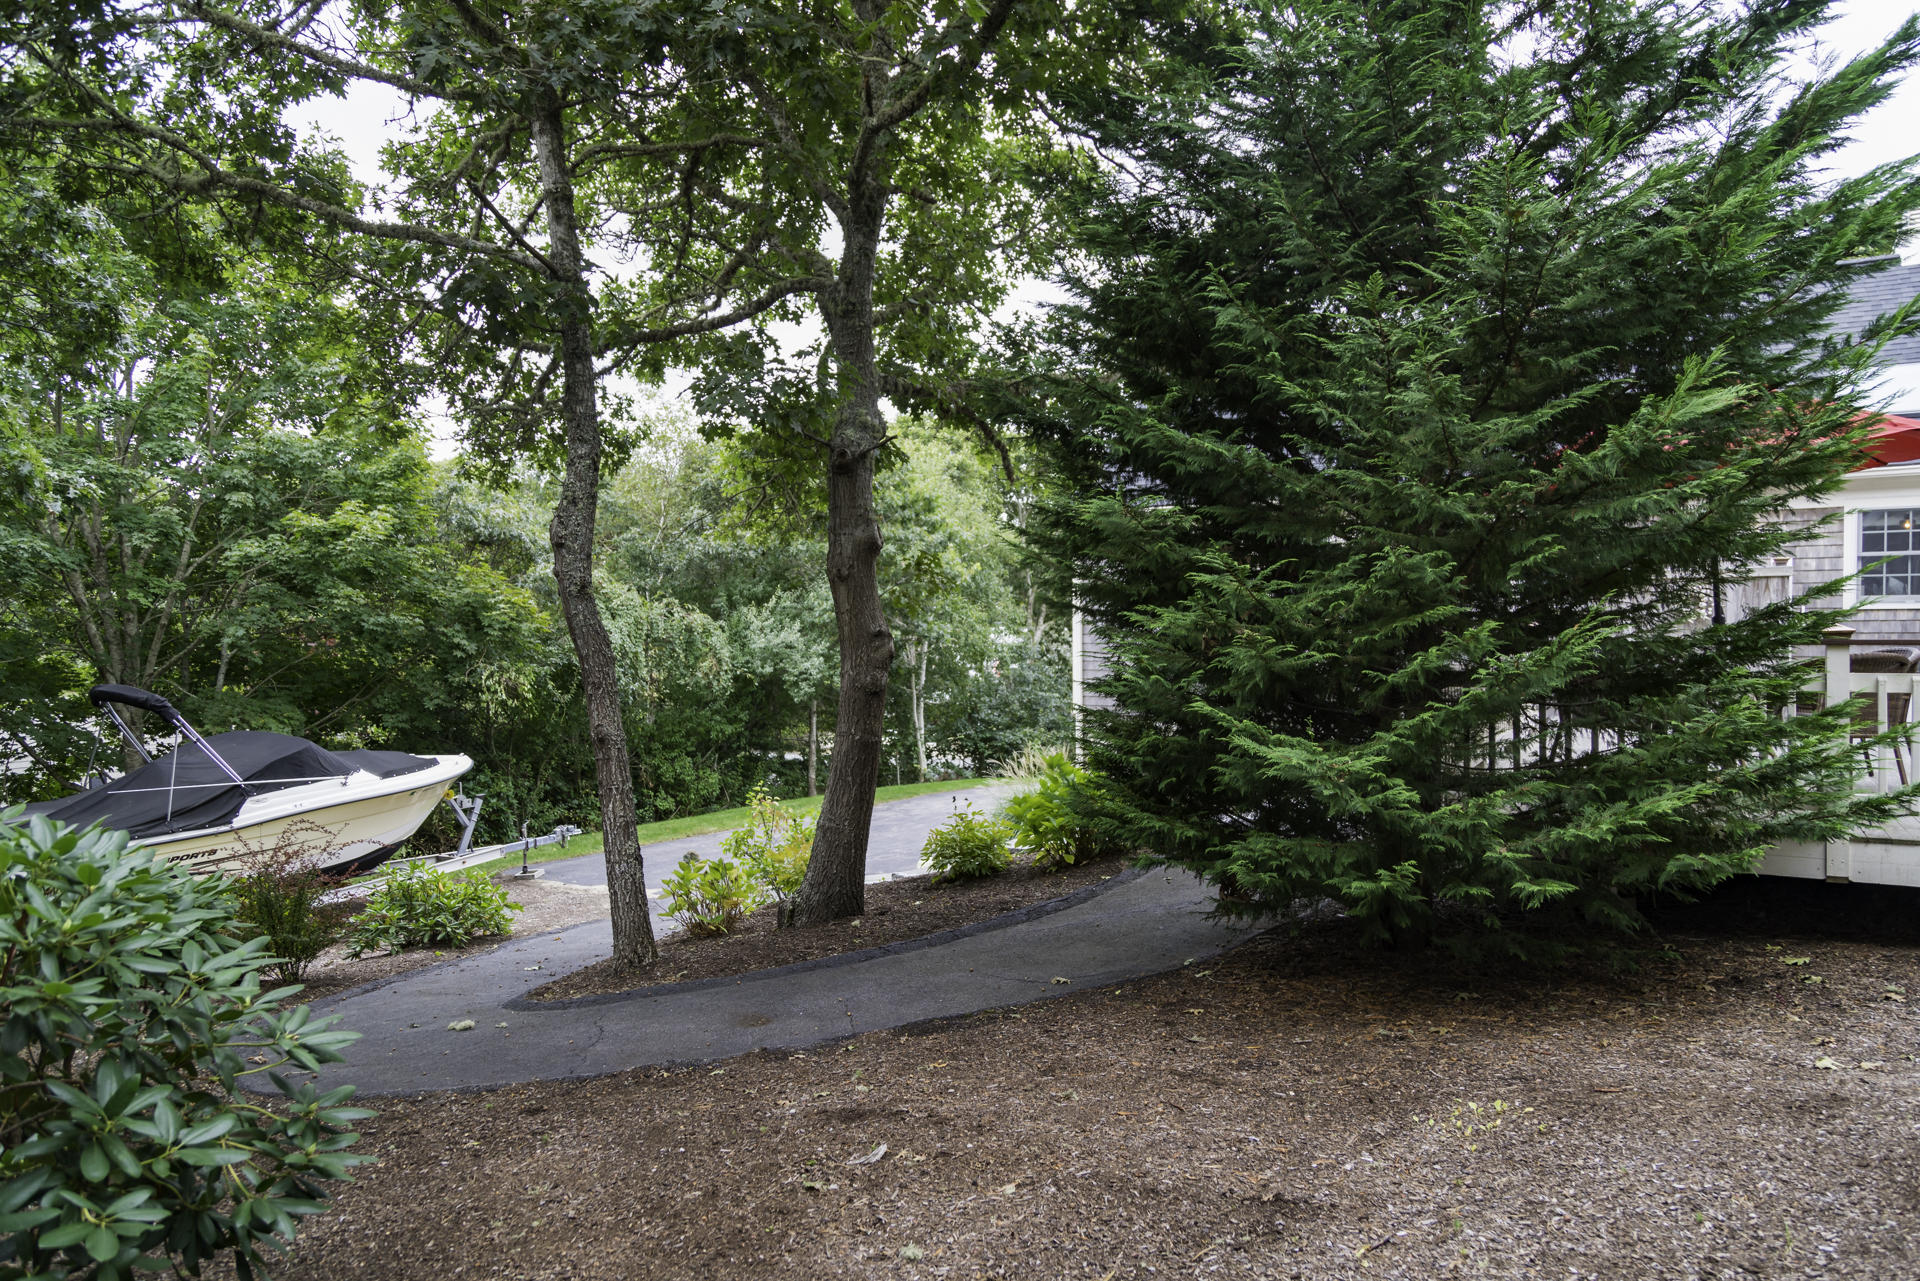 206 Deer Meadow Lane, Chatham MA, 02633 - slide 33